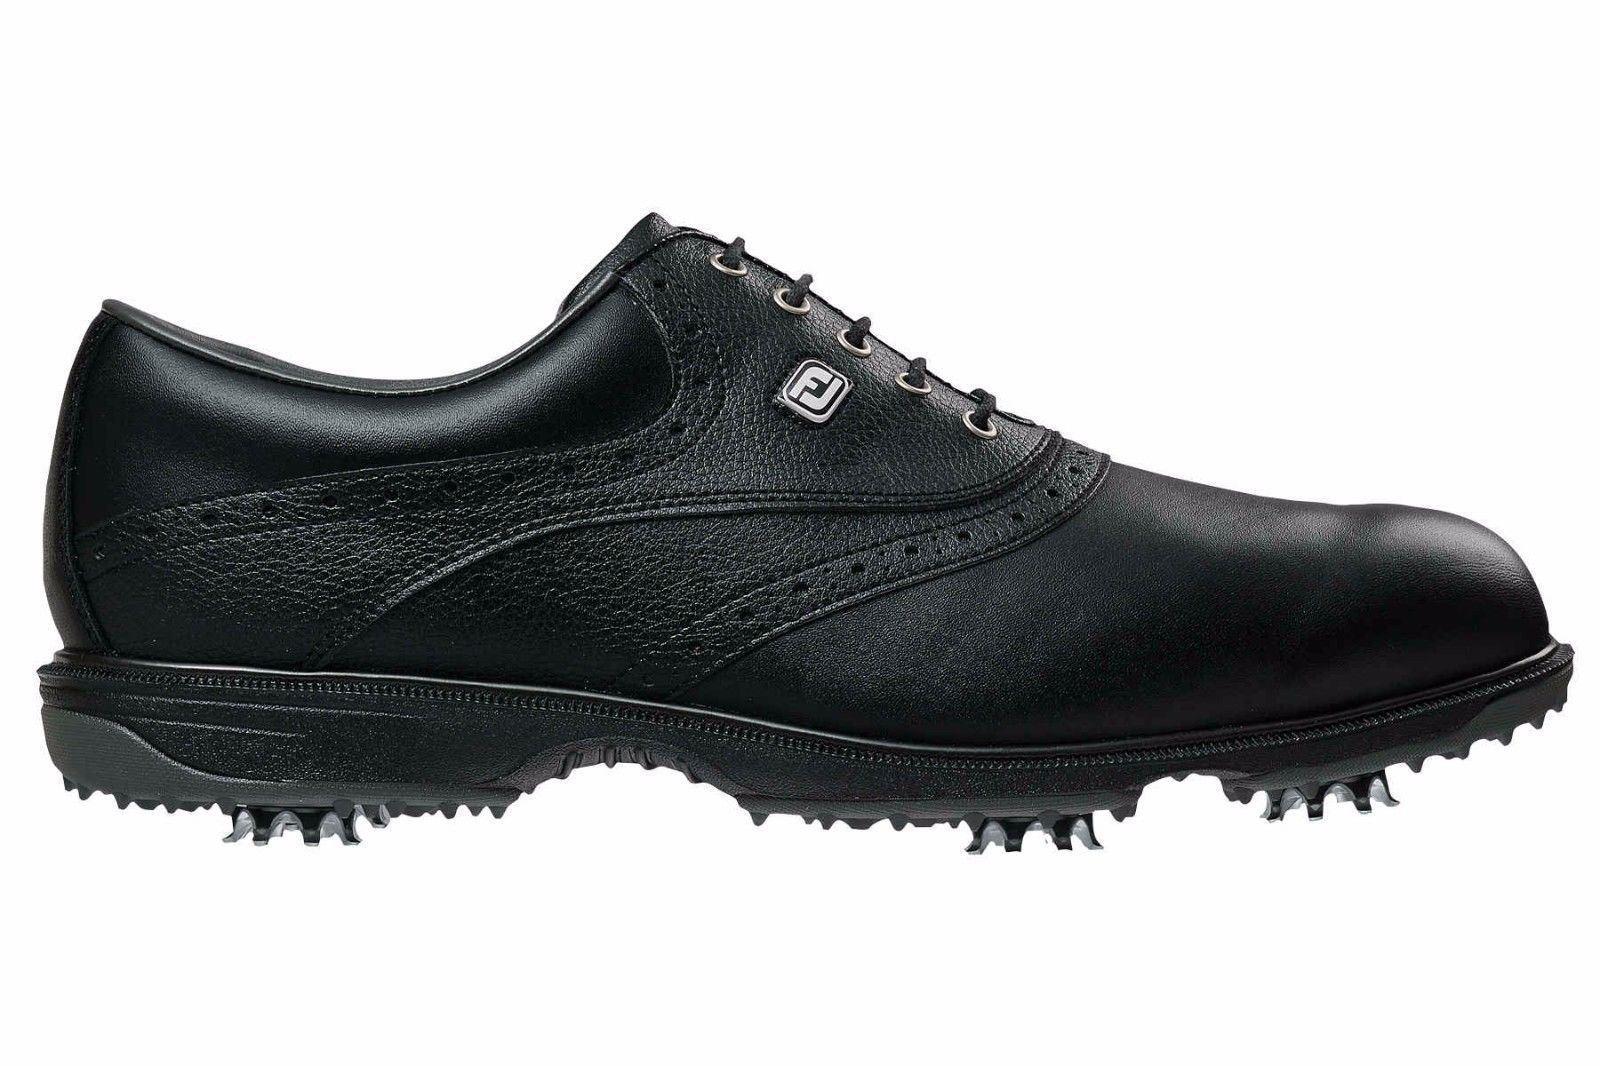 footjoy hydrolite 2.0 golf shoes review